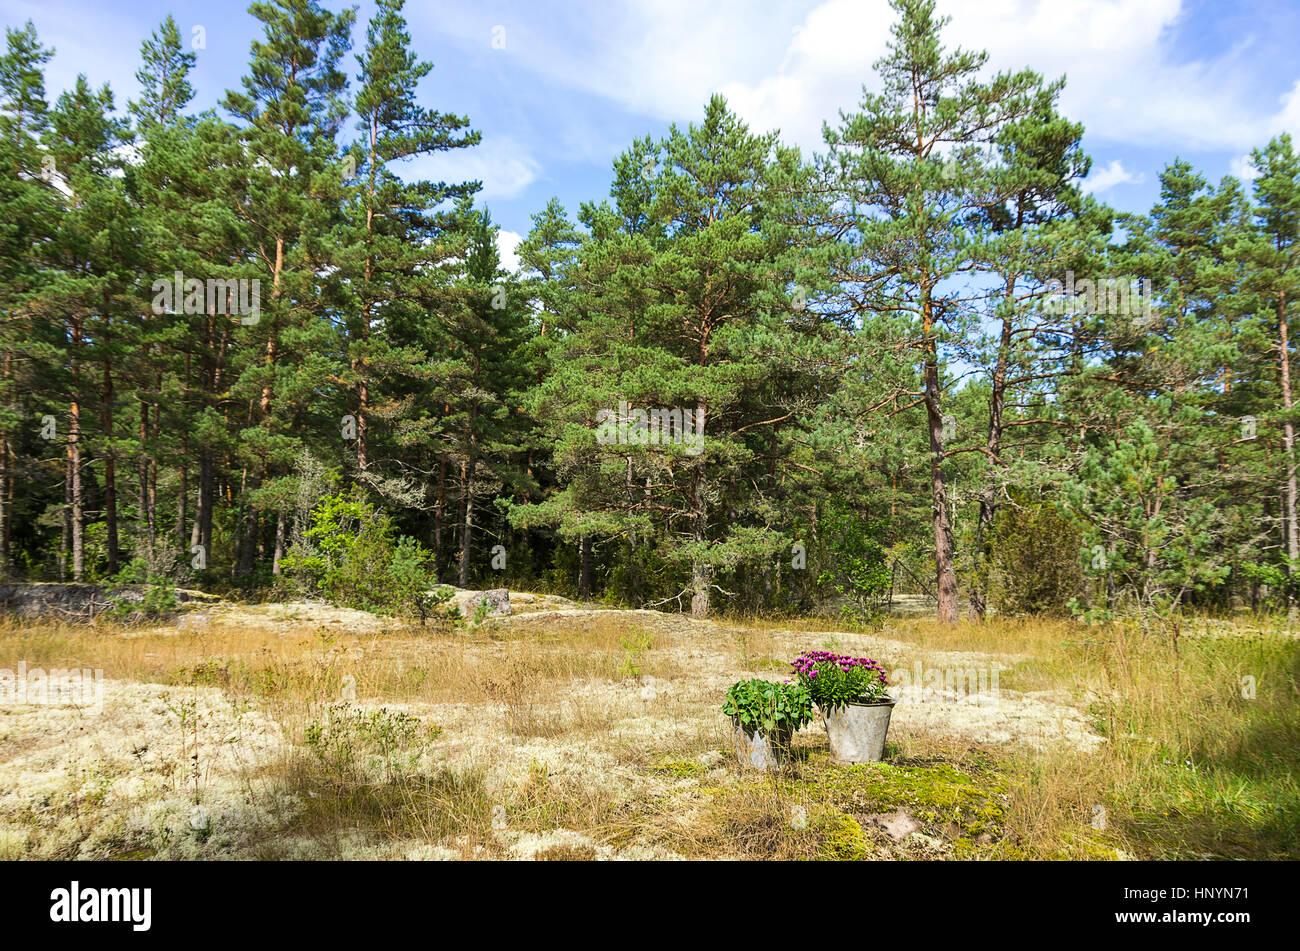 Minimalist landscaping in the countryside near Oskarshamn, Kalmar County, Sweden. - Stock Image